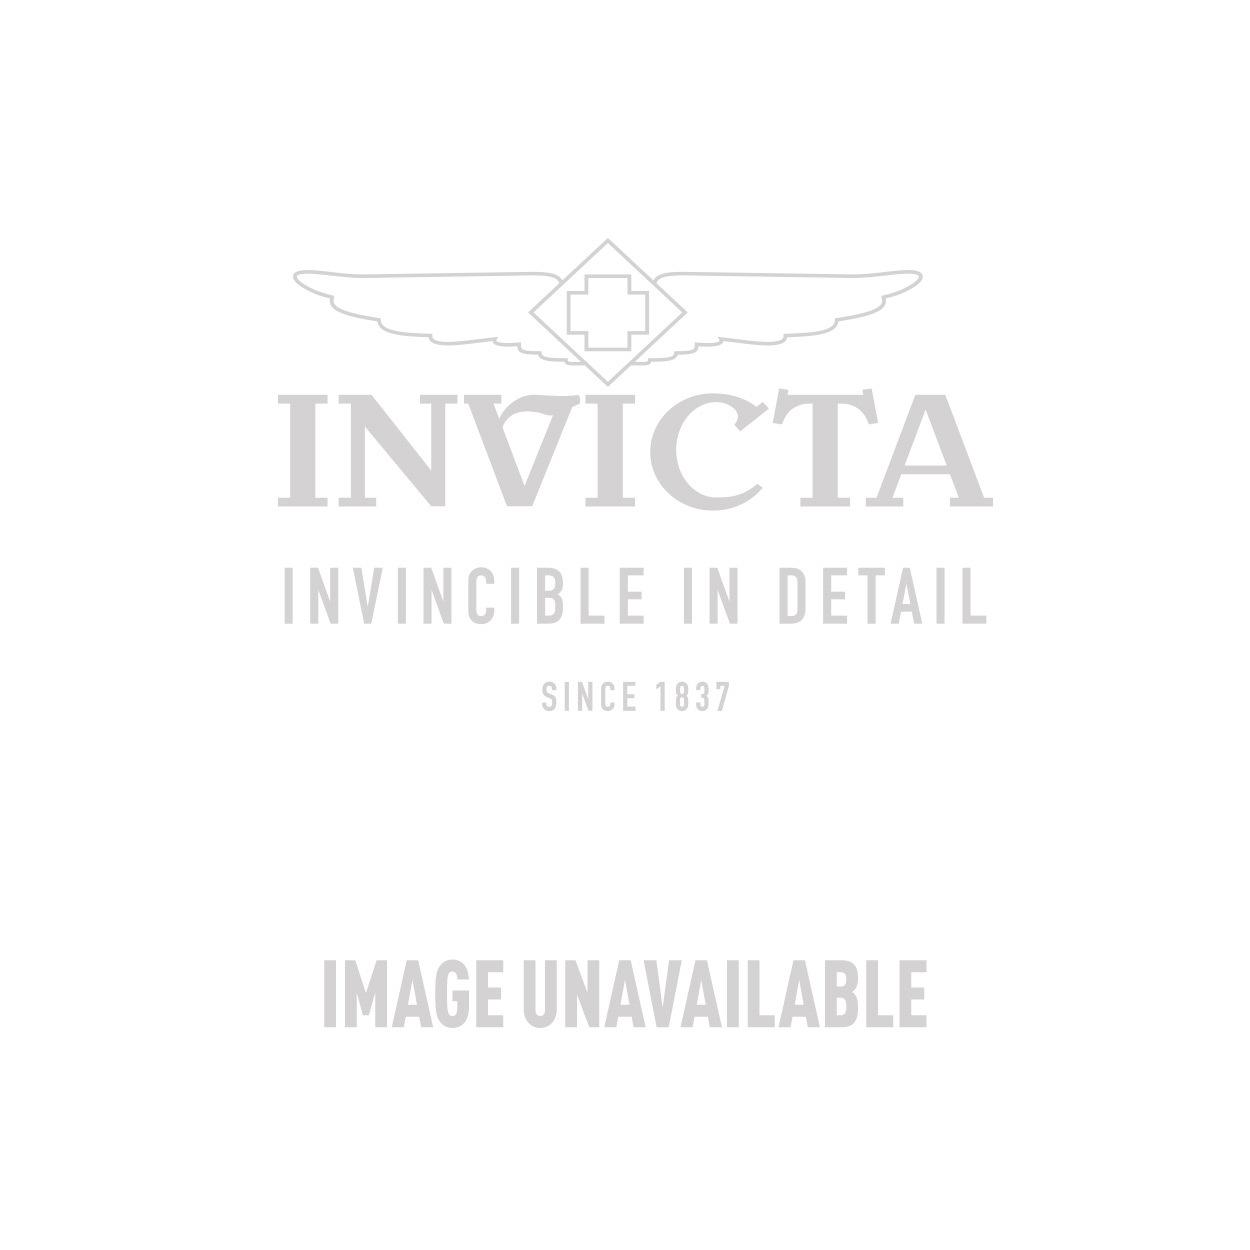 Invicta Specialty Swiss Movement Quartz Watch - Black case with Yellow tone Polyurethane band - Model 1907